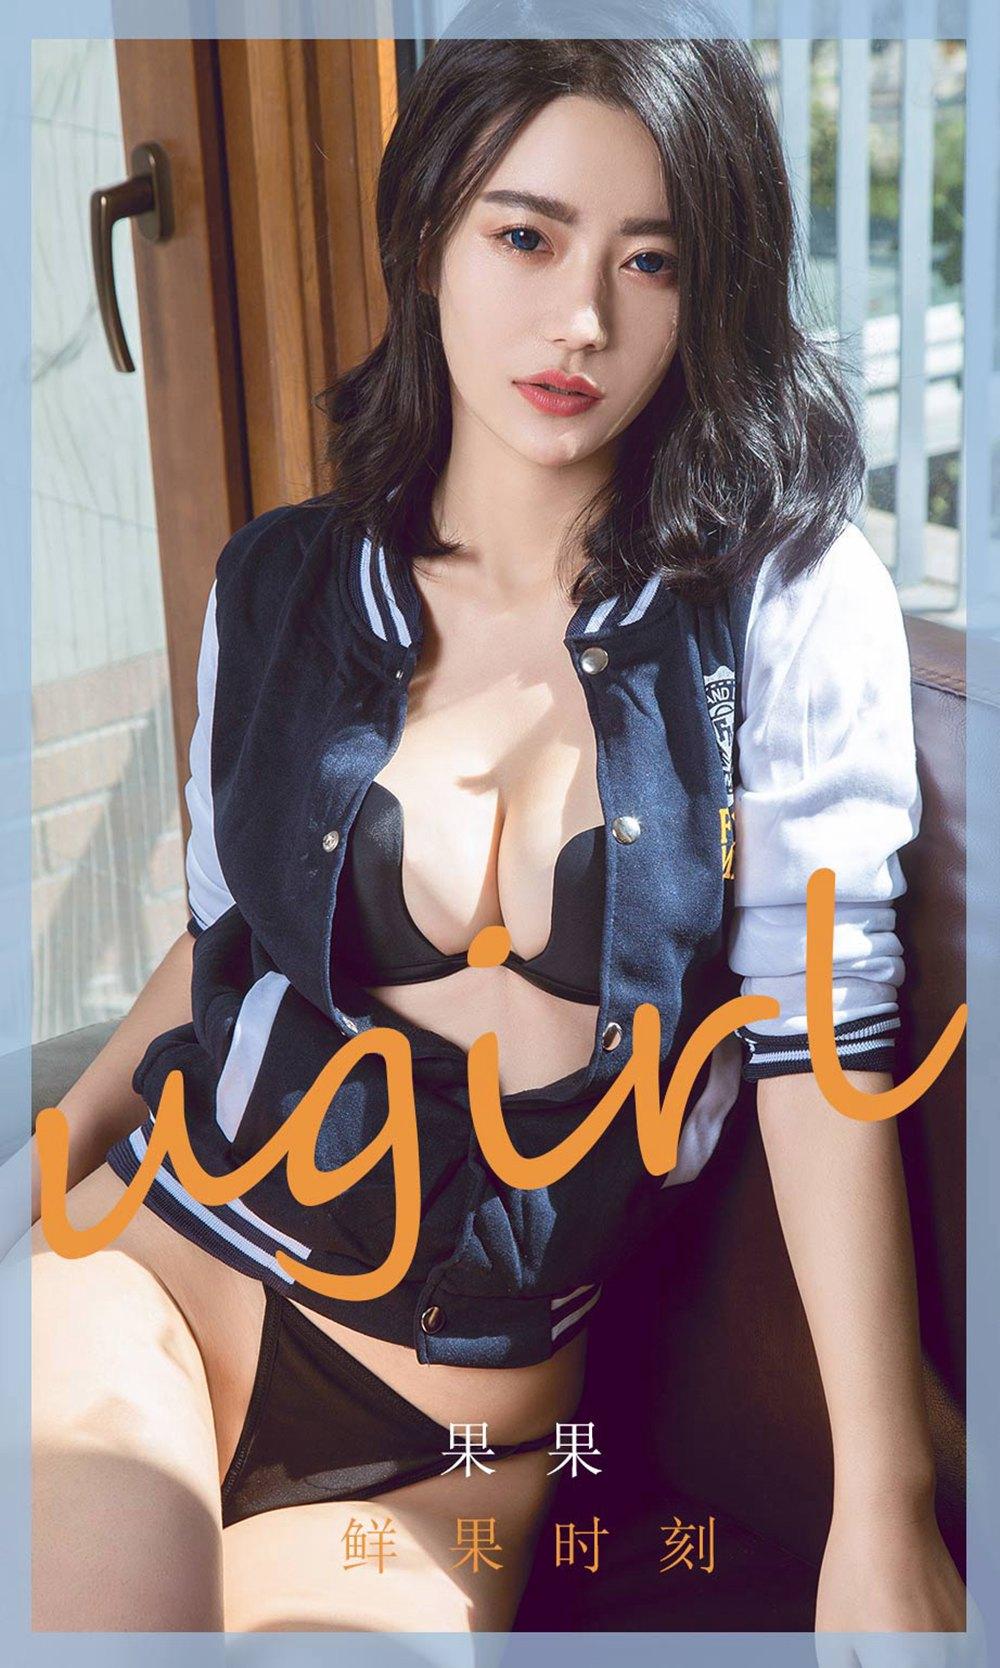 [Ugirls尤果网]爱尤物专辑 2020.04.14 No.1791 果果 鲜果时刻 [35P] -第1张